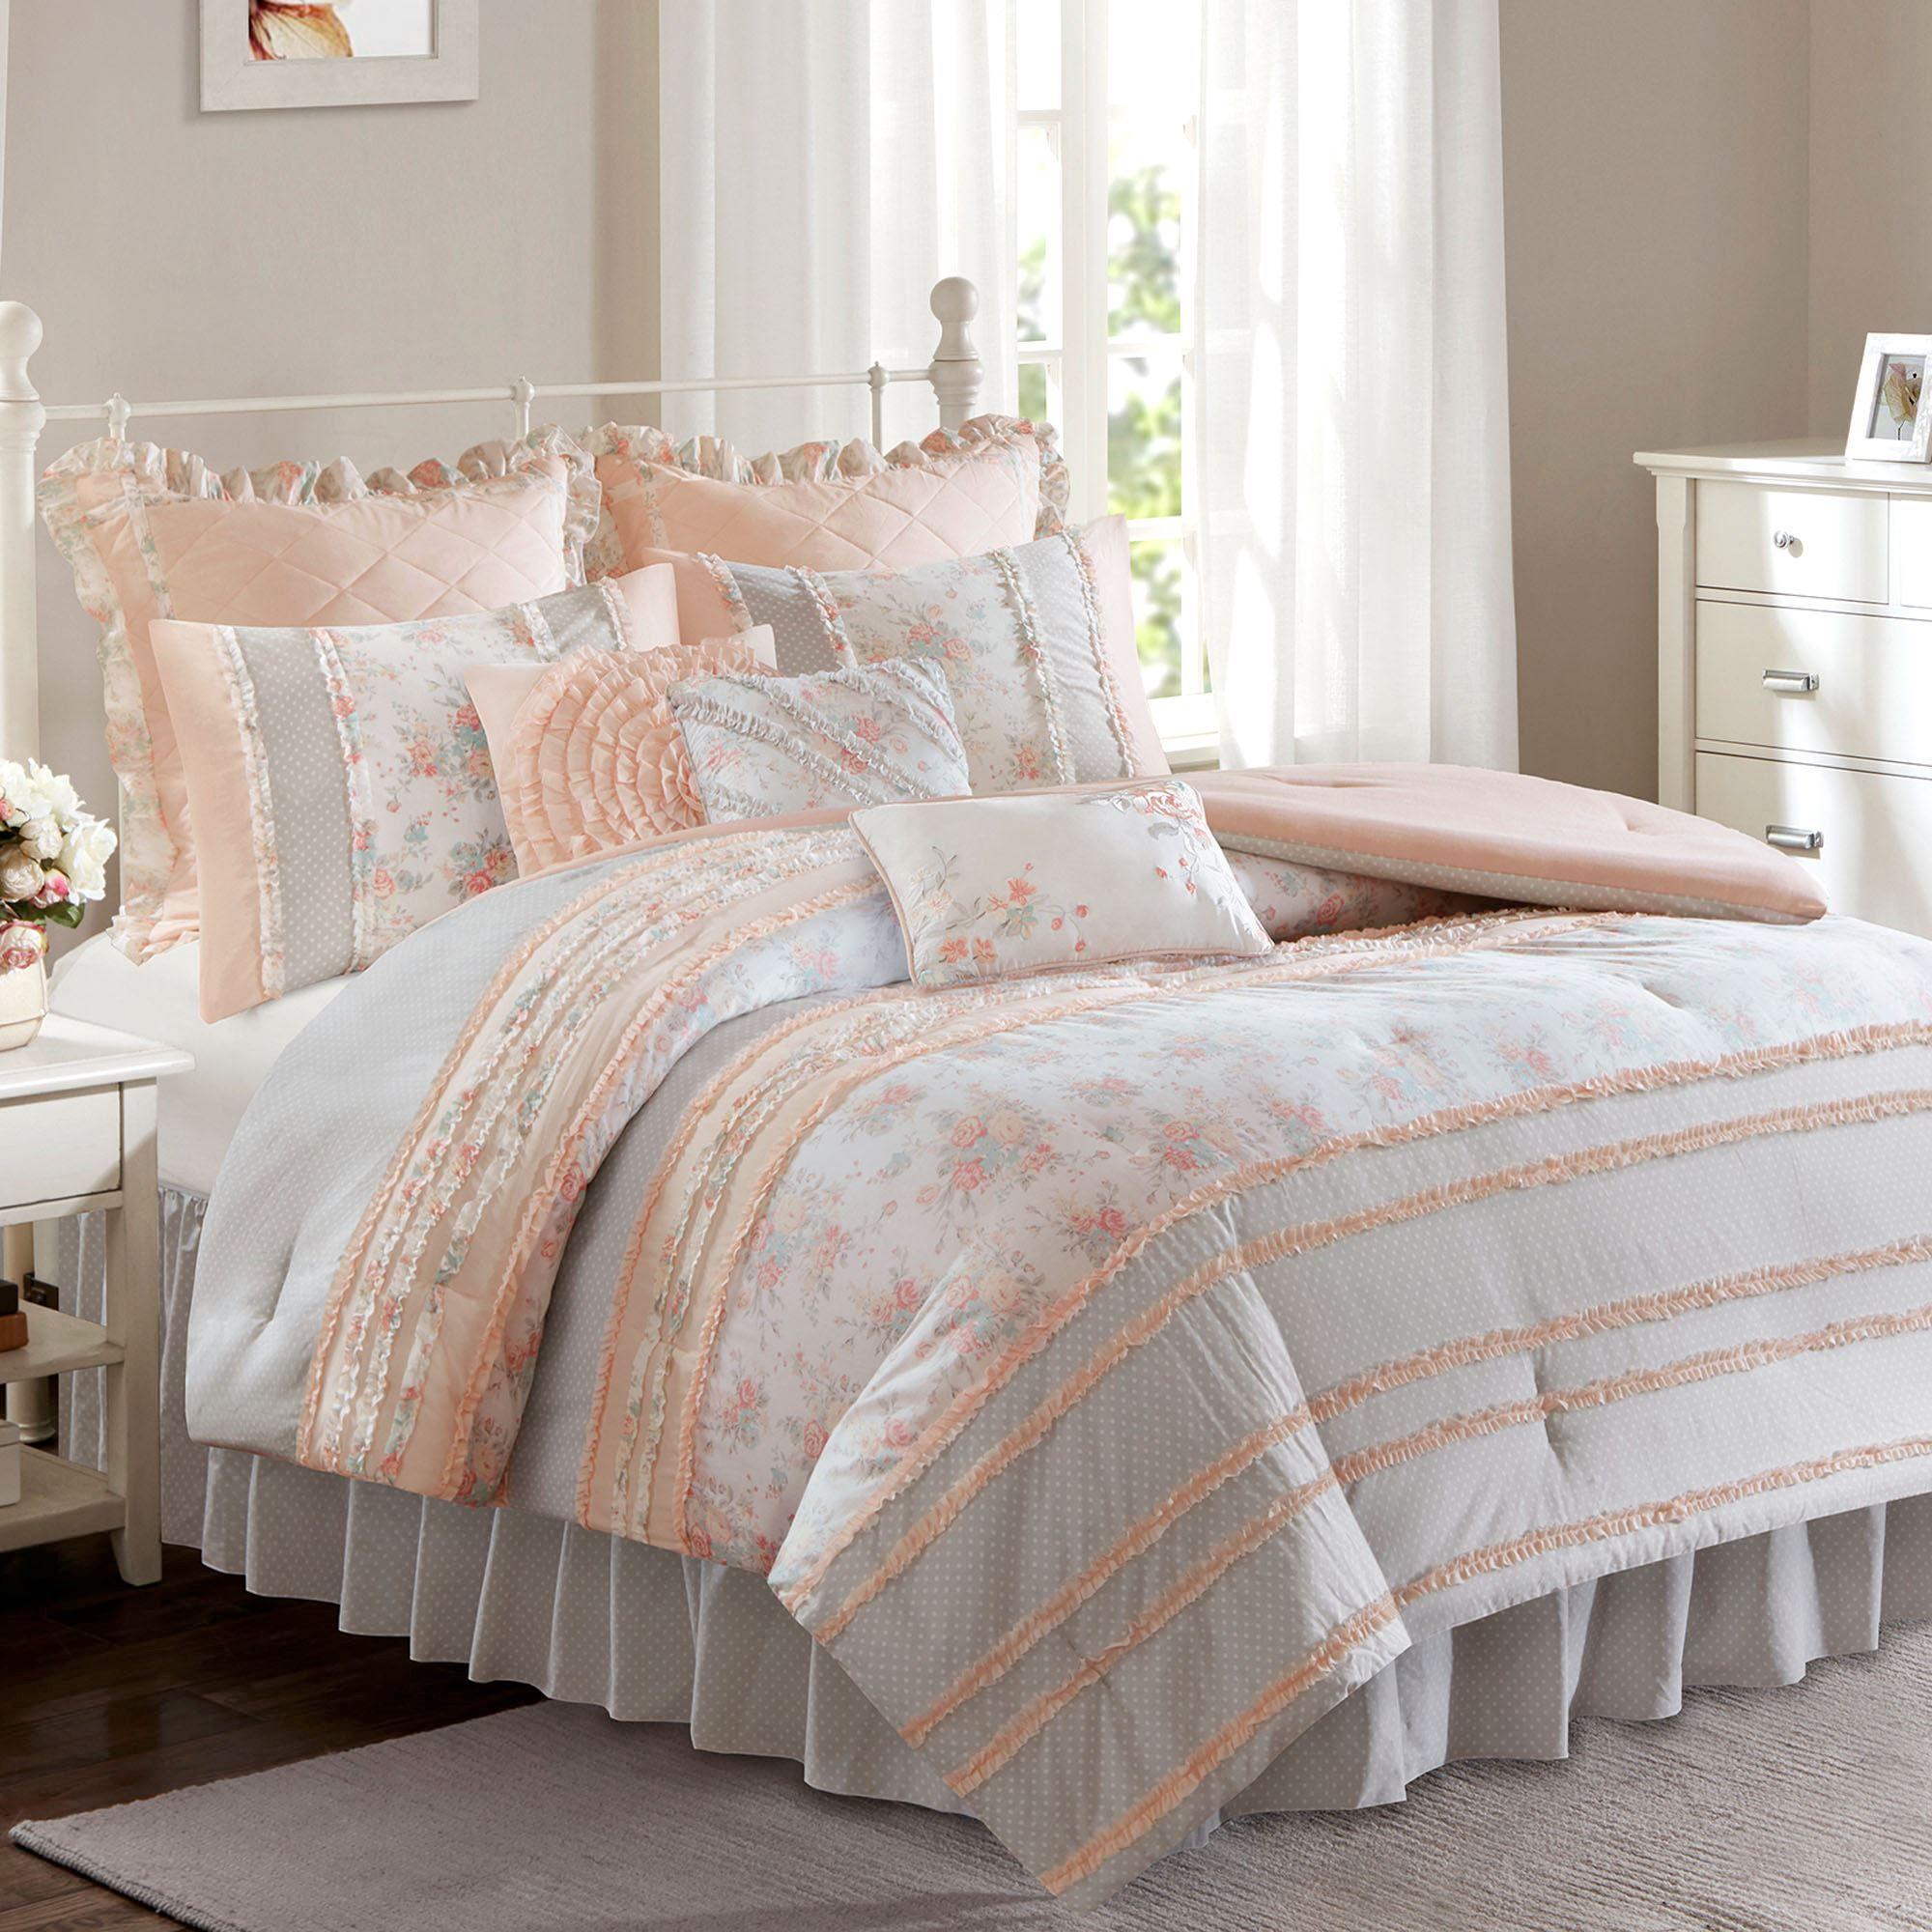 Serena Peach Ruffle 7 9 Pc Comforter Bed Set